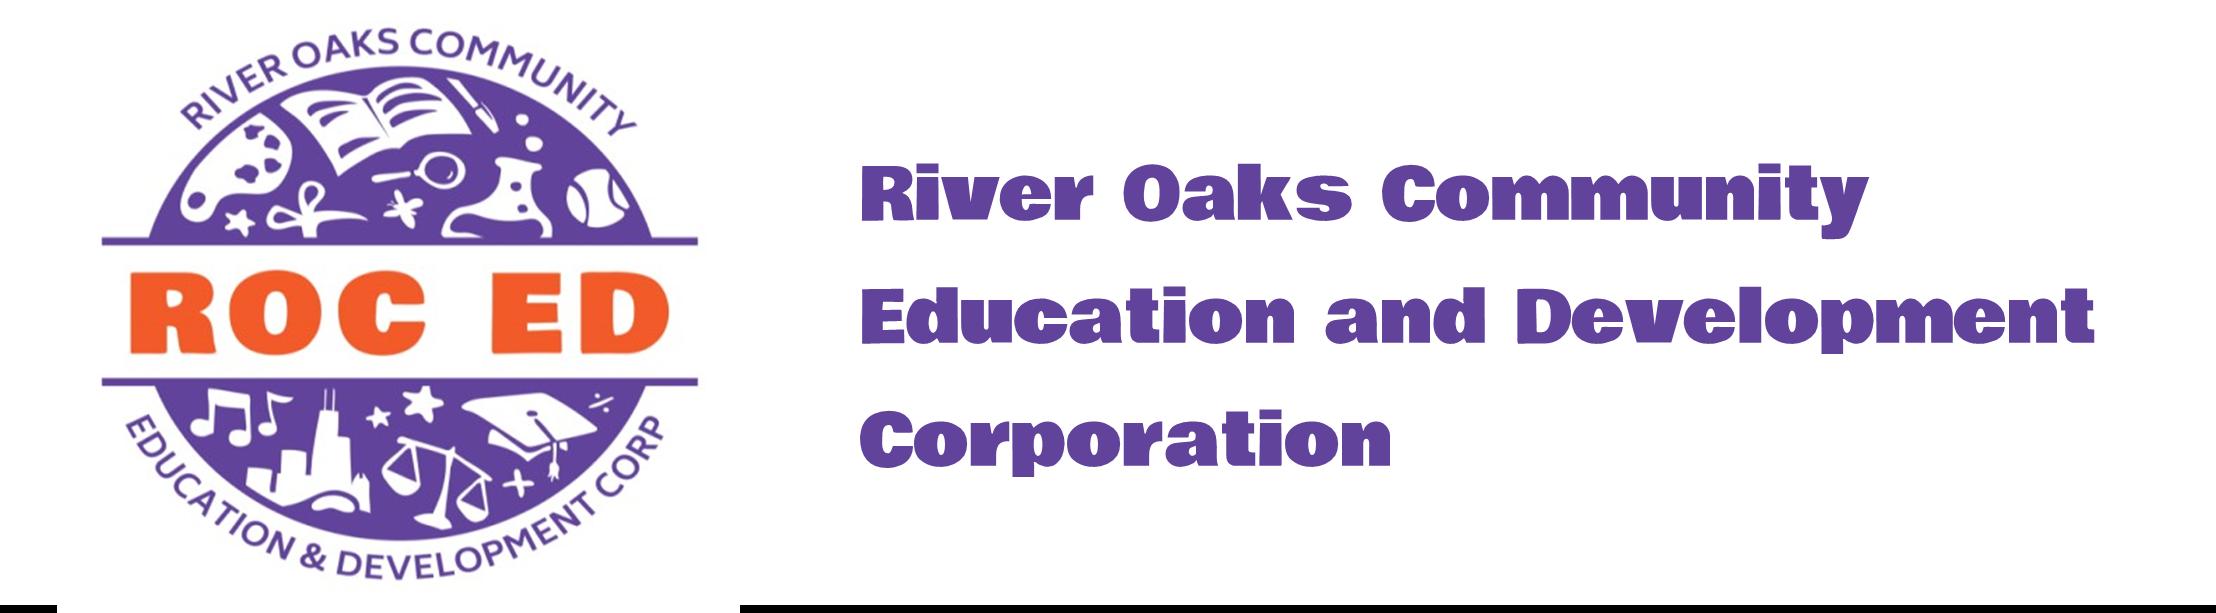 ROC ED - River Oaks Community Education & Development Corp